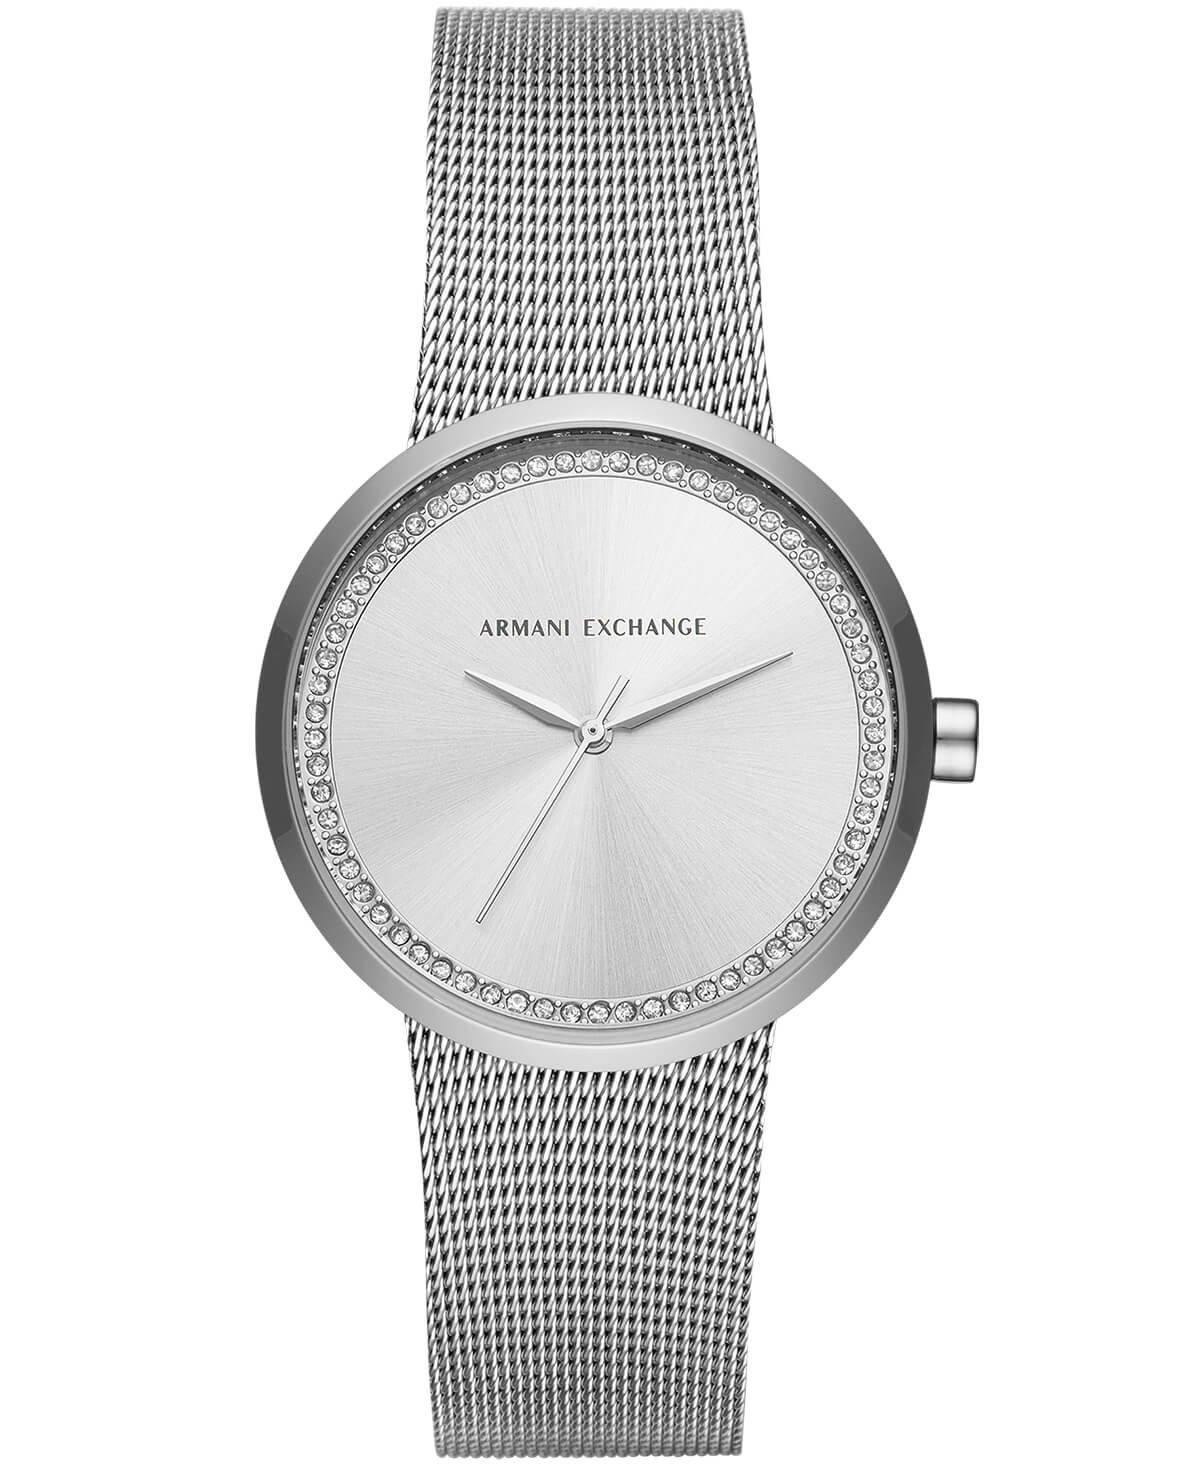 Reloj Dama Armani Exchange AX4501 SEARS COM MX Me a45ba00919e4